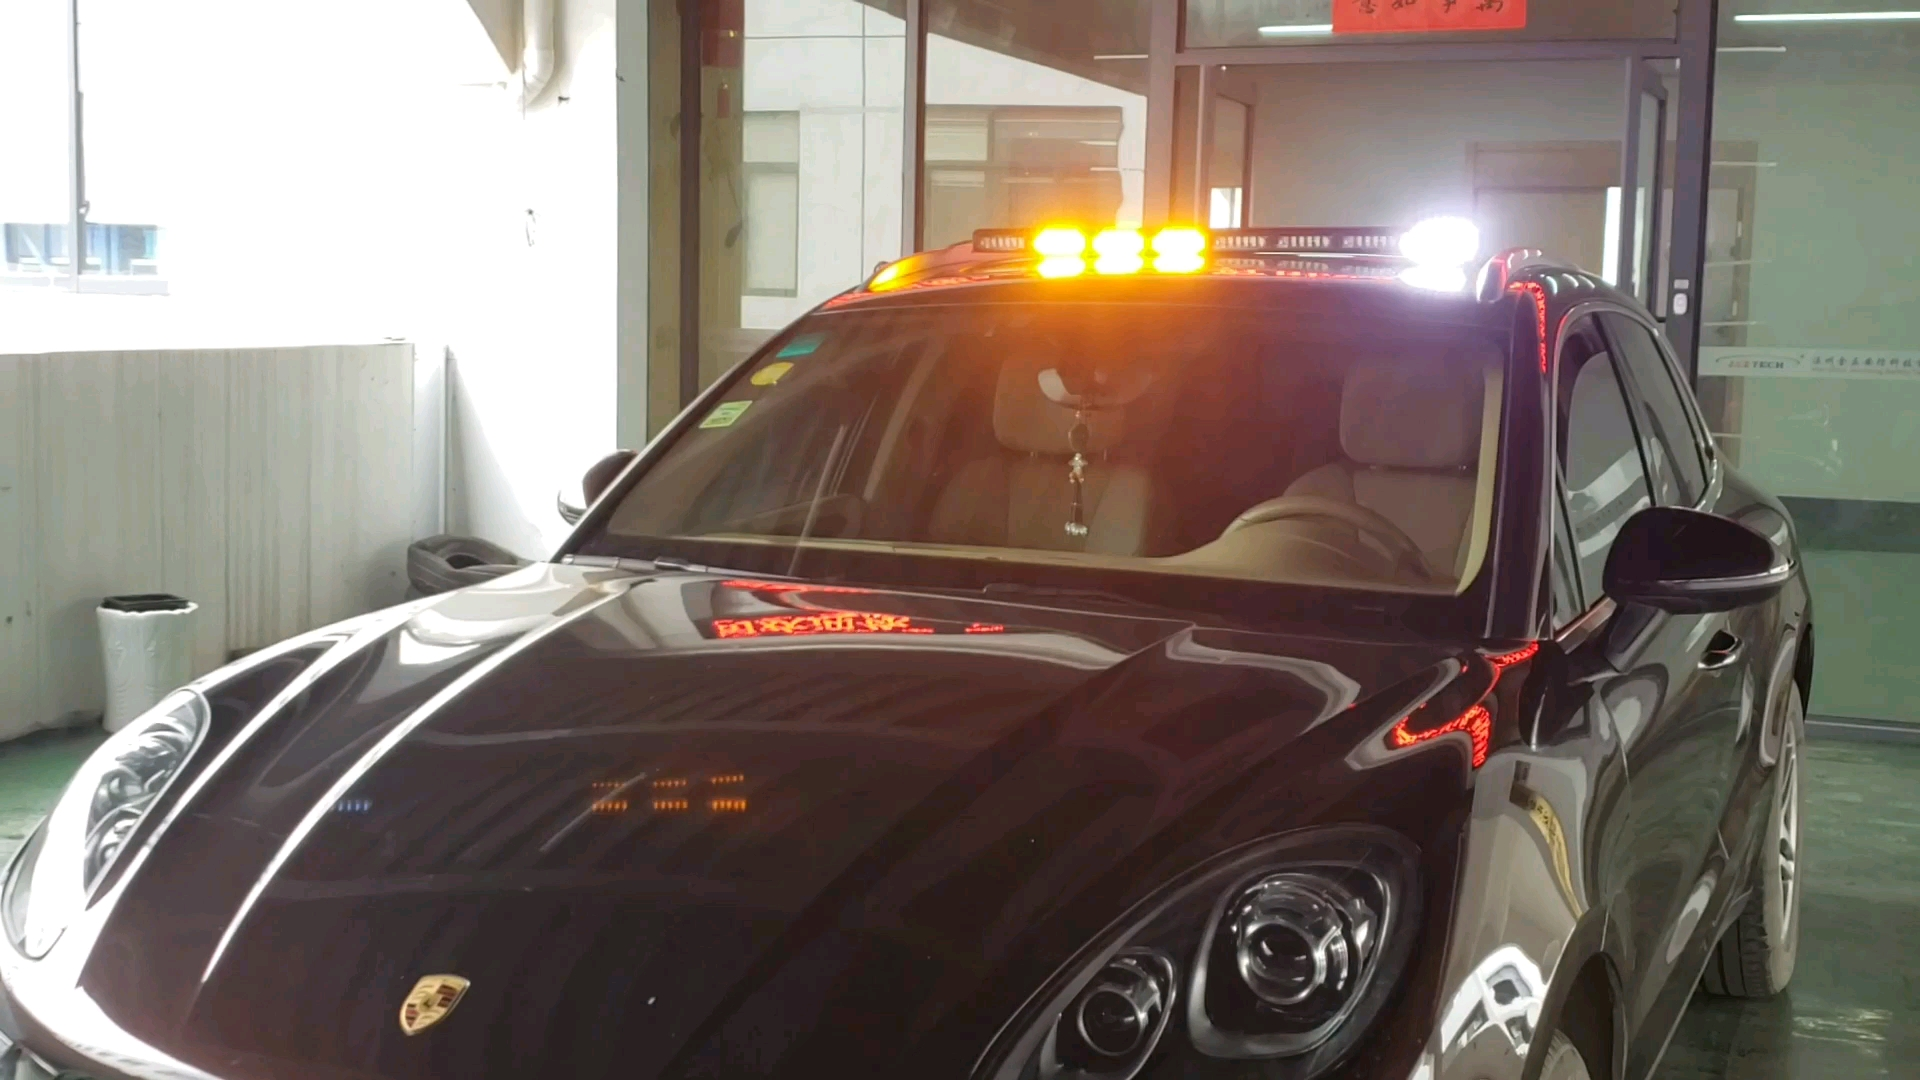 Clear lens customized traffic advisor and DC12V-DC12-24V Dash and visor lights